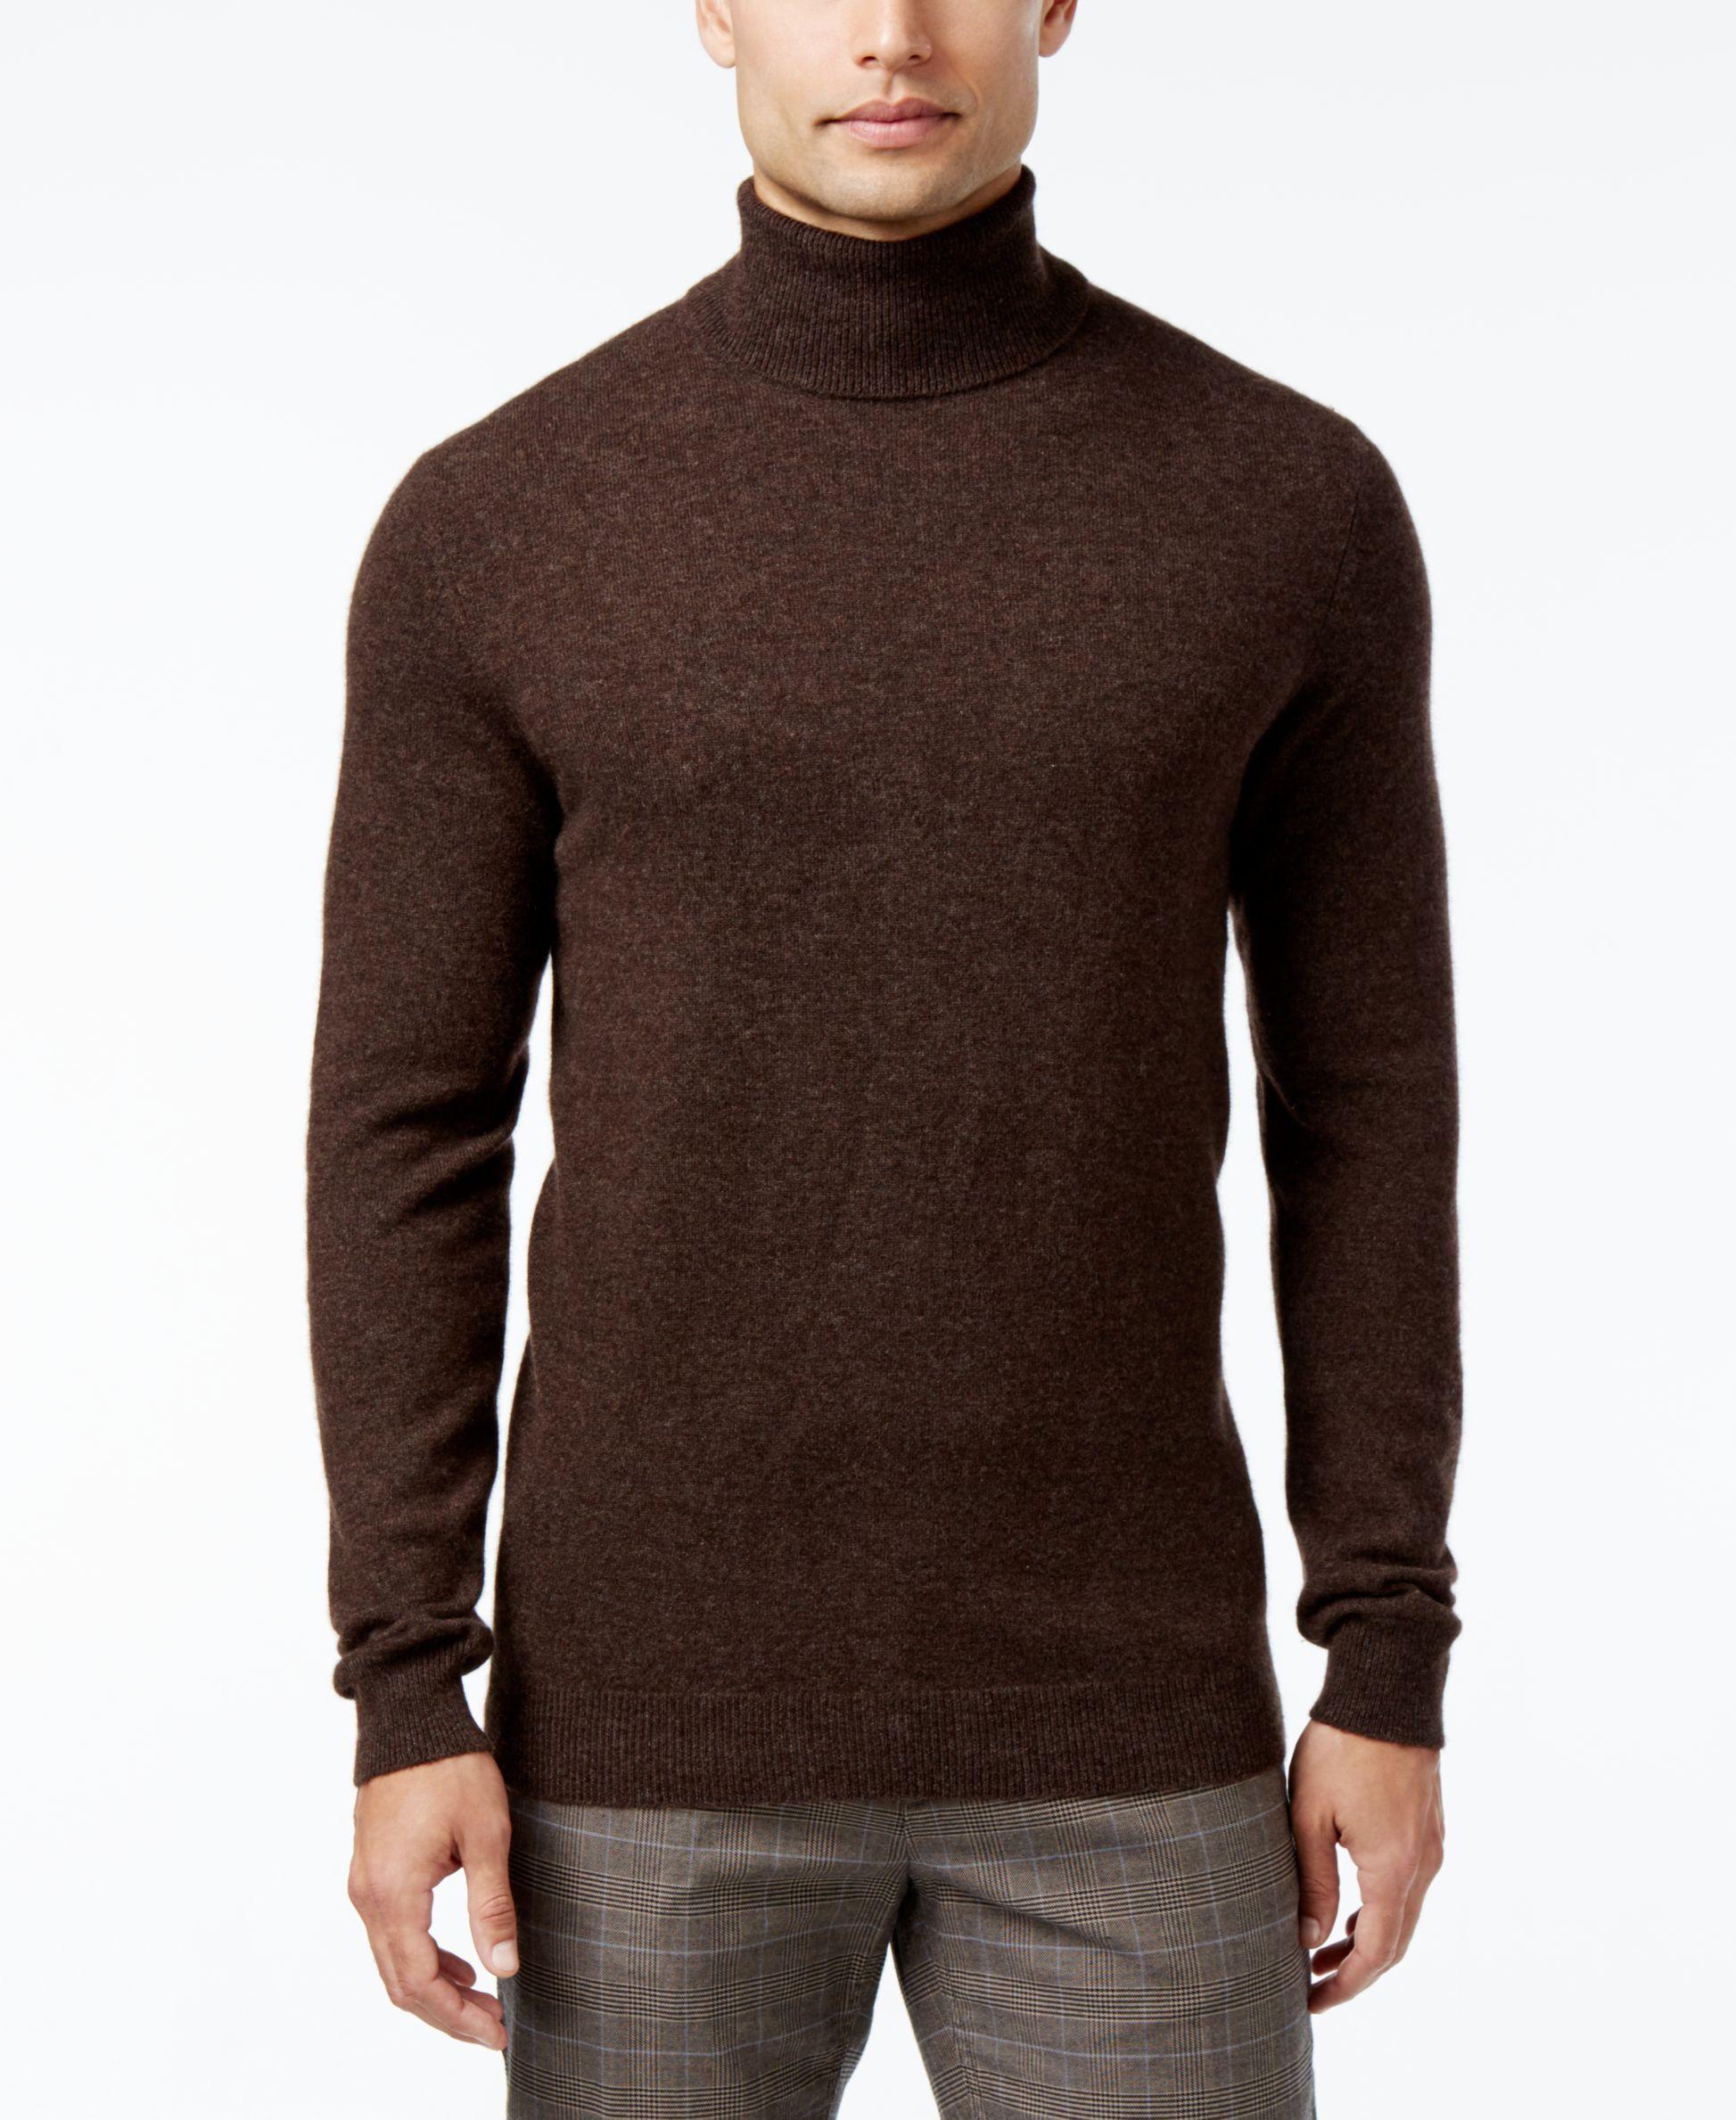 Club Room Men S Cashmere Turtleneck Sweater Only At Macy S Mens Cashmere Cashmere Turtleneck Sweaters [ 2378 x 1947 Pixel ]